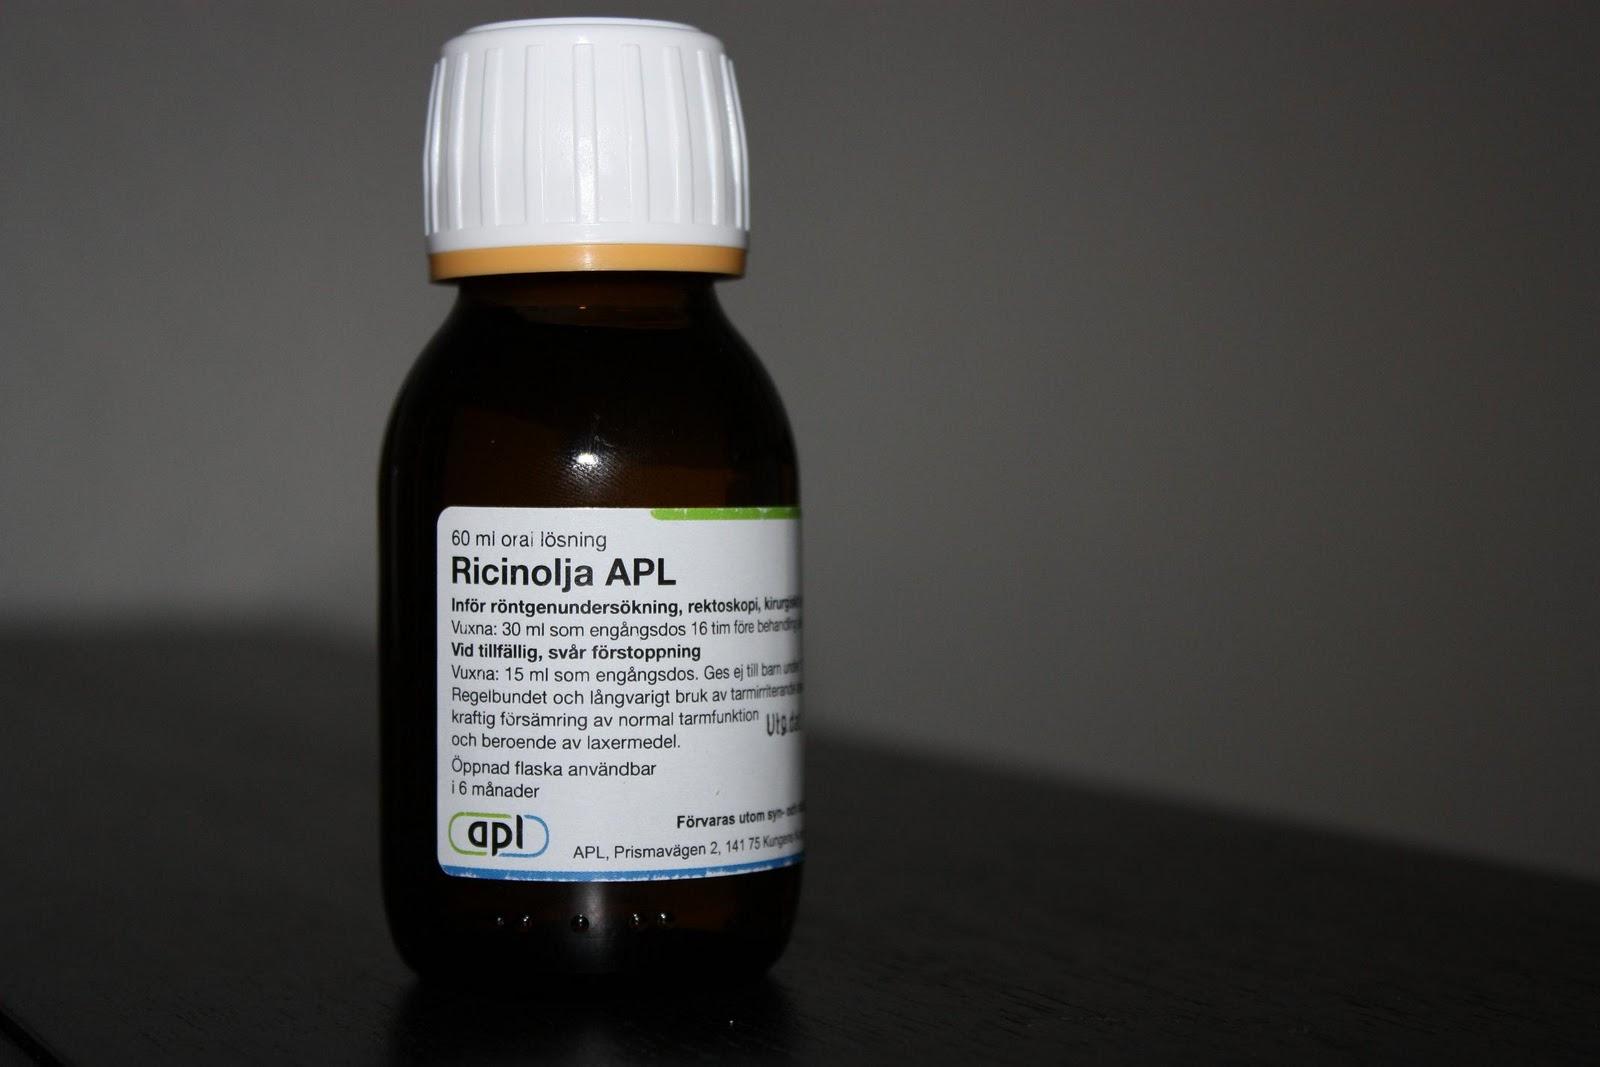 ricinolja laxermedel dosering